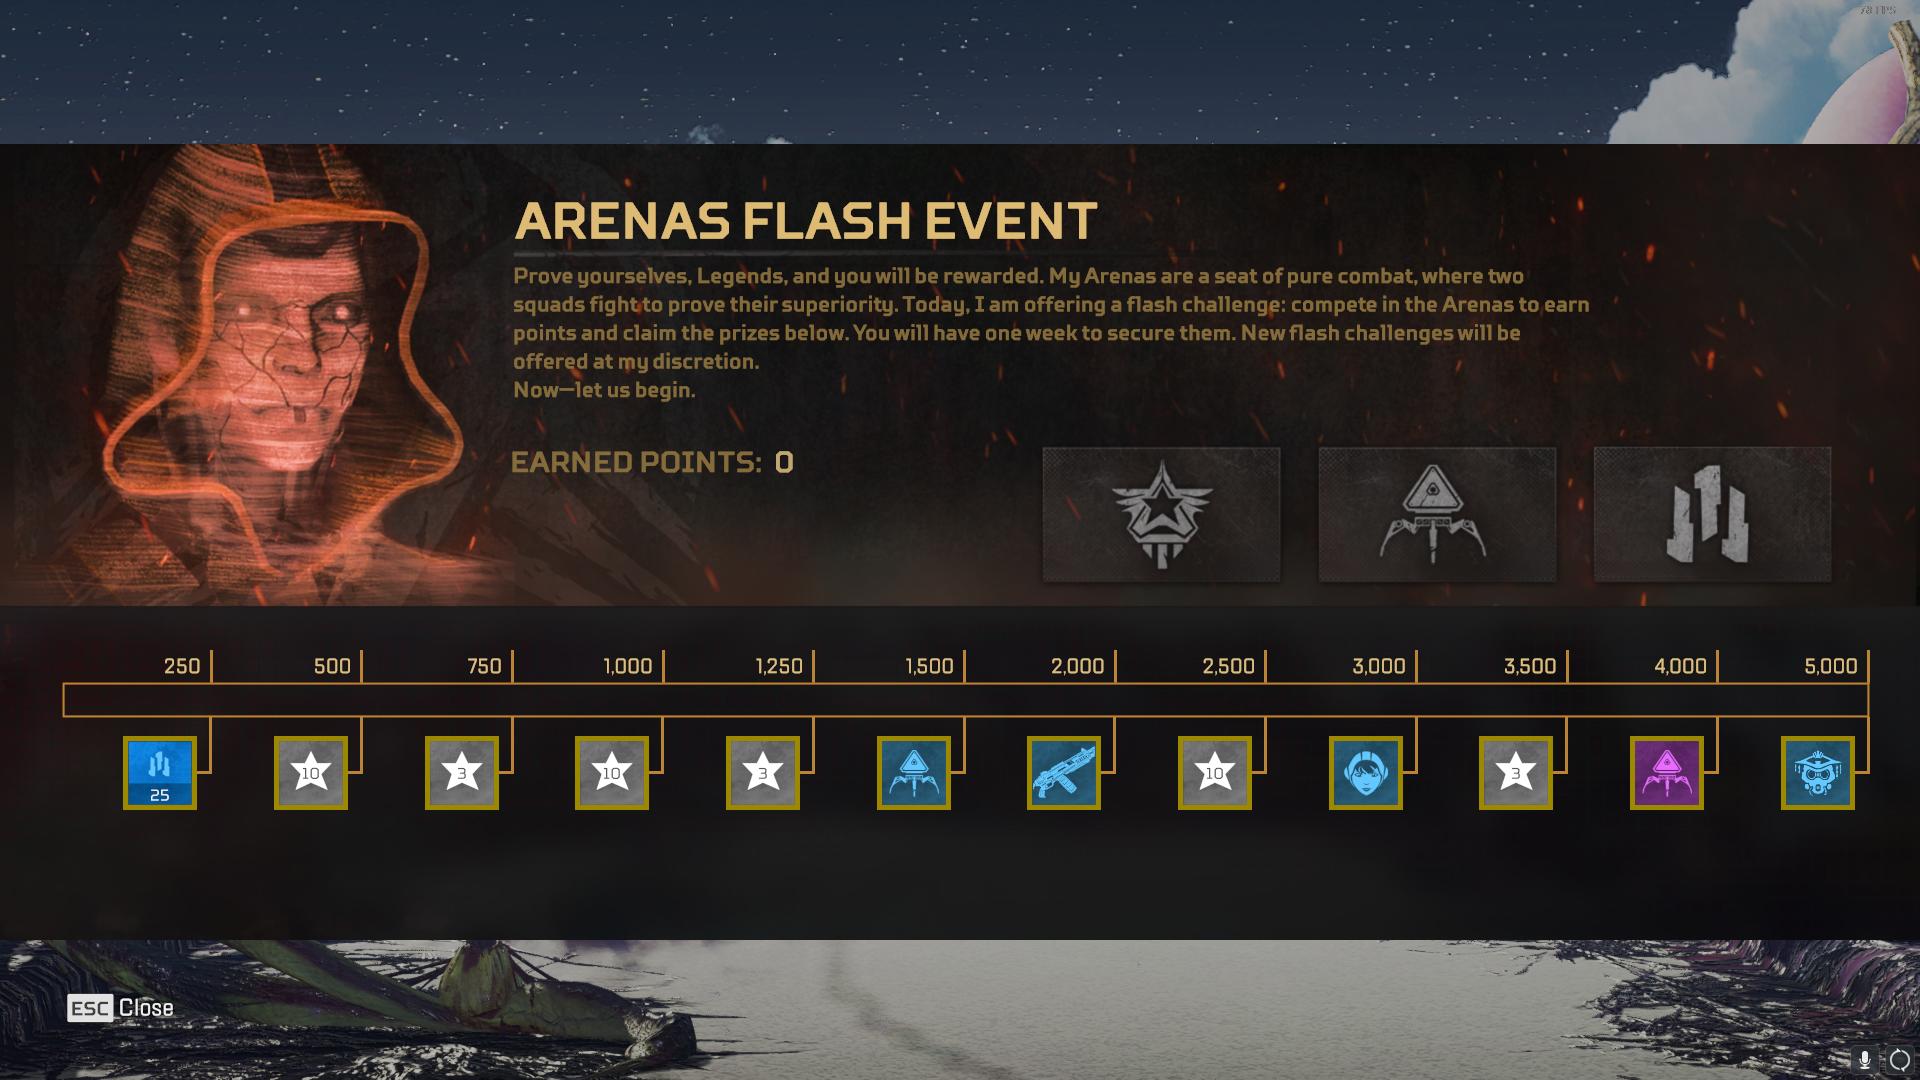 Apex Legends Arena Flash Event Points